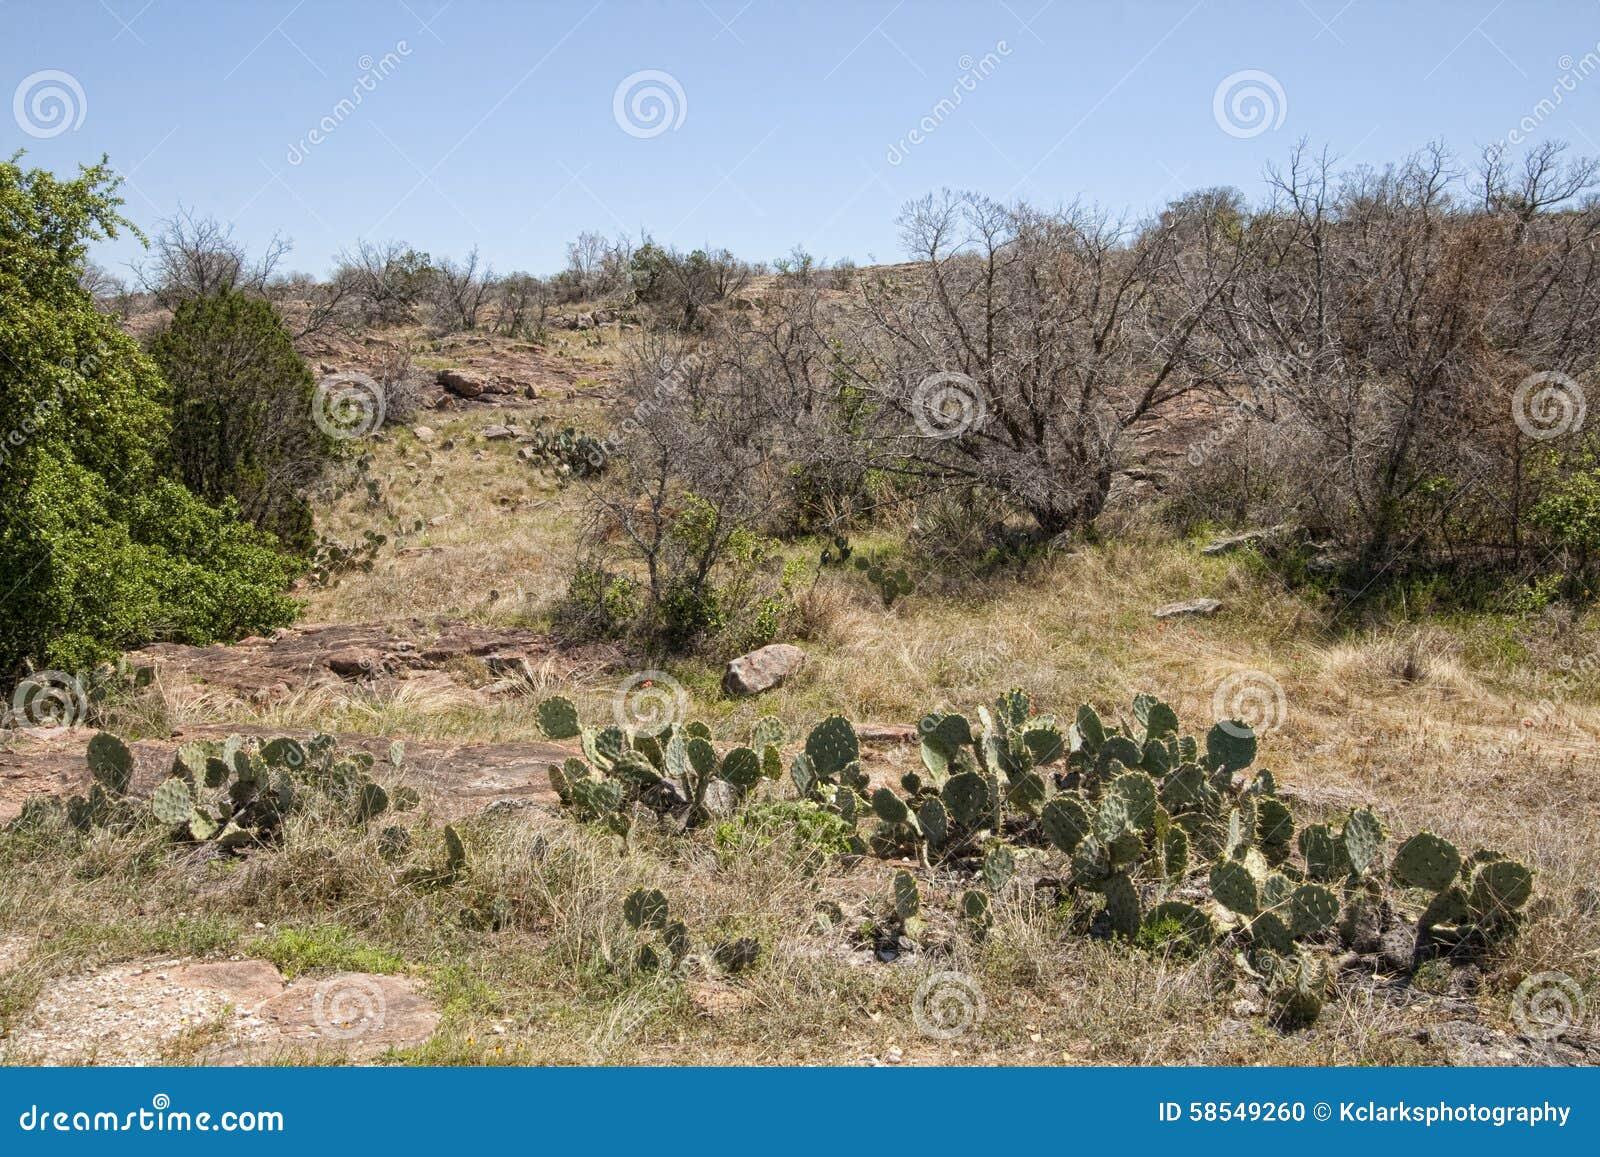 Картинки природы техаса